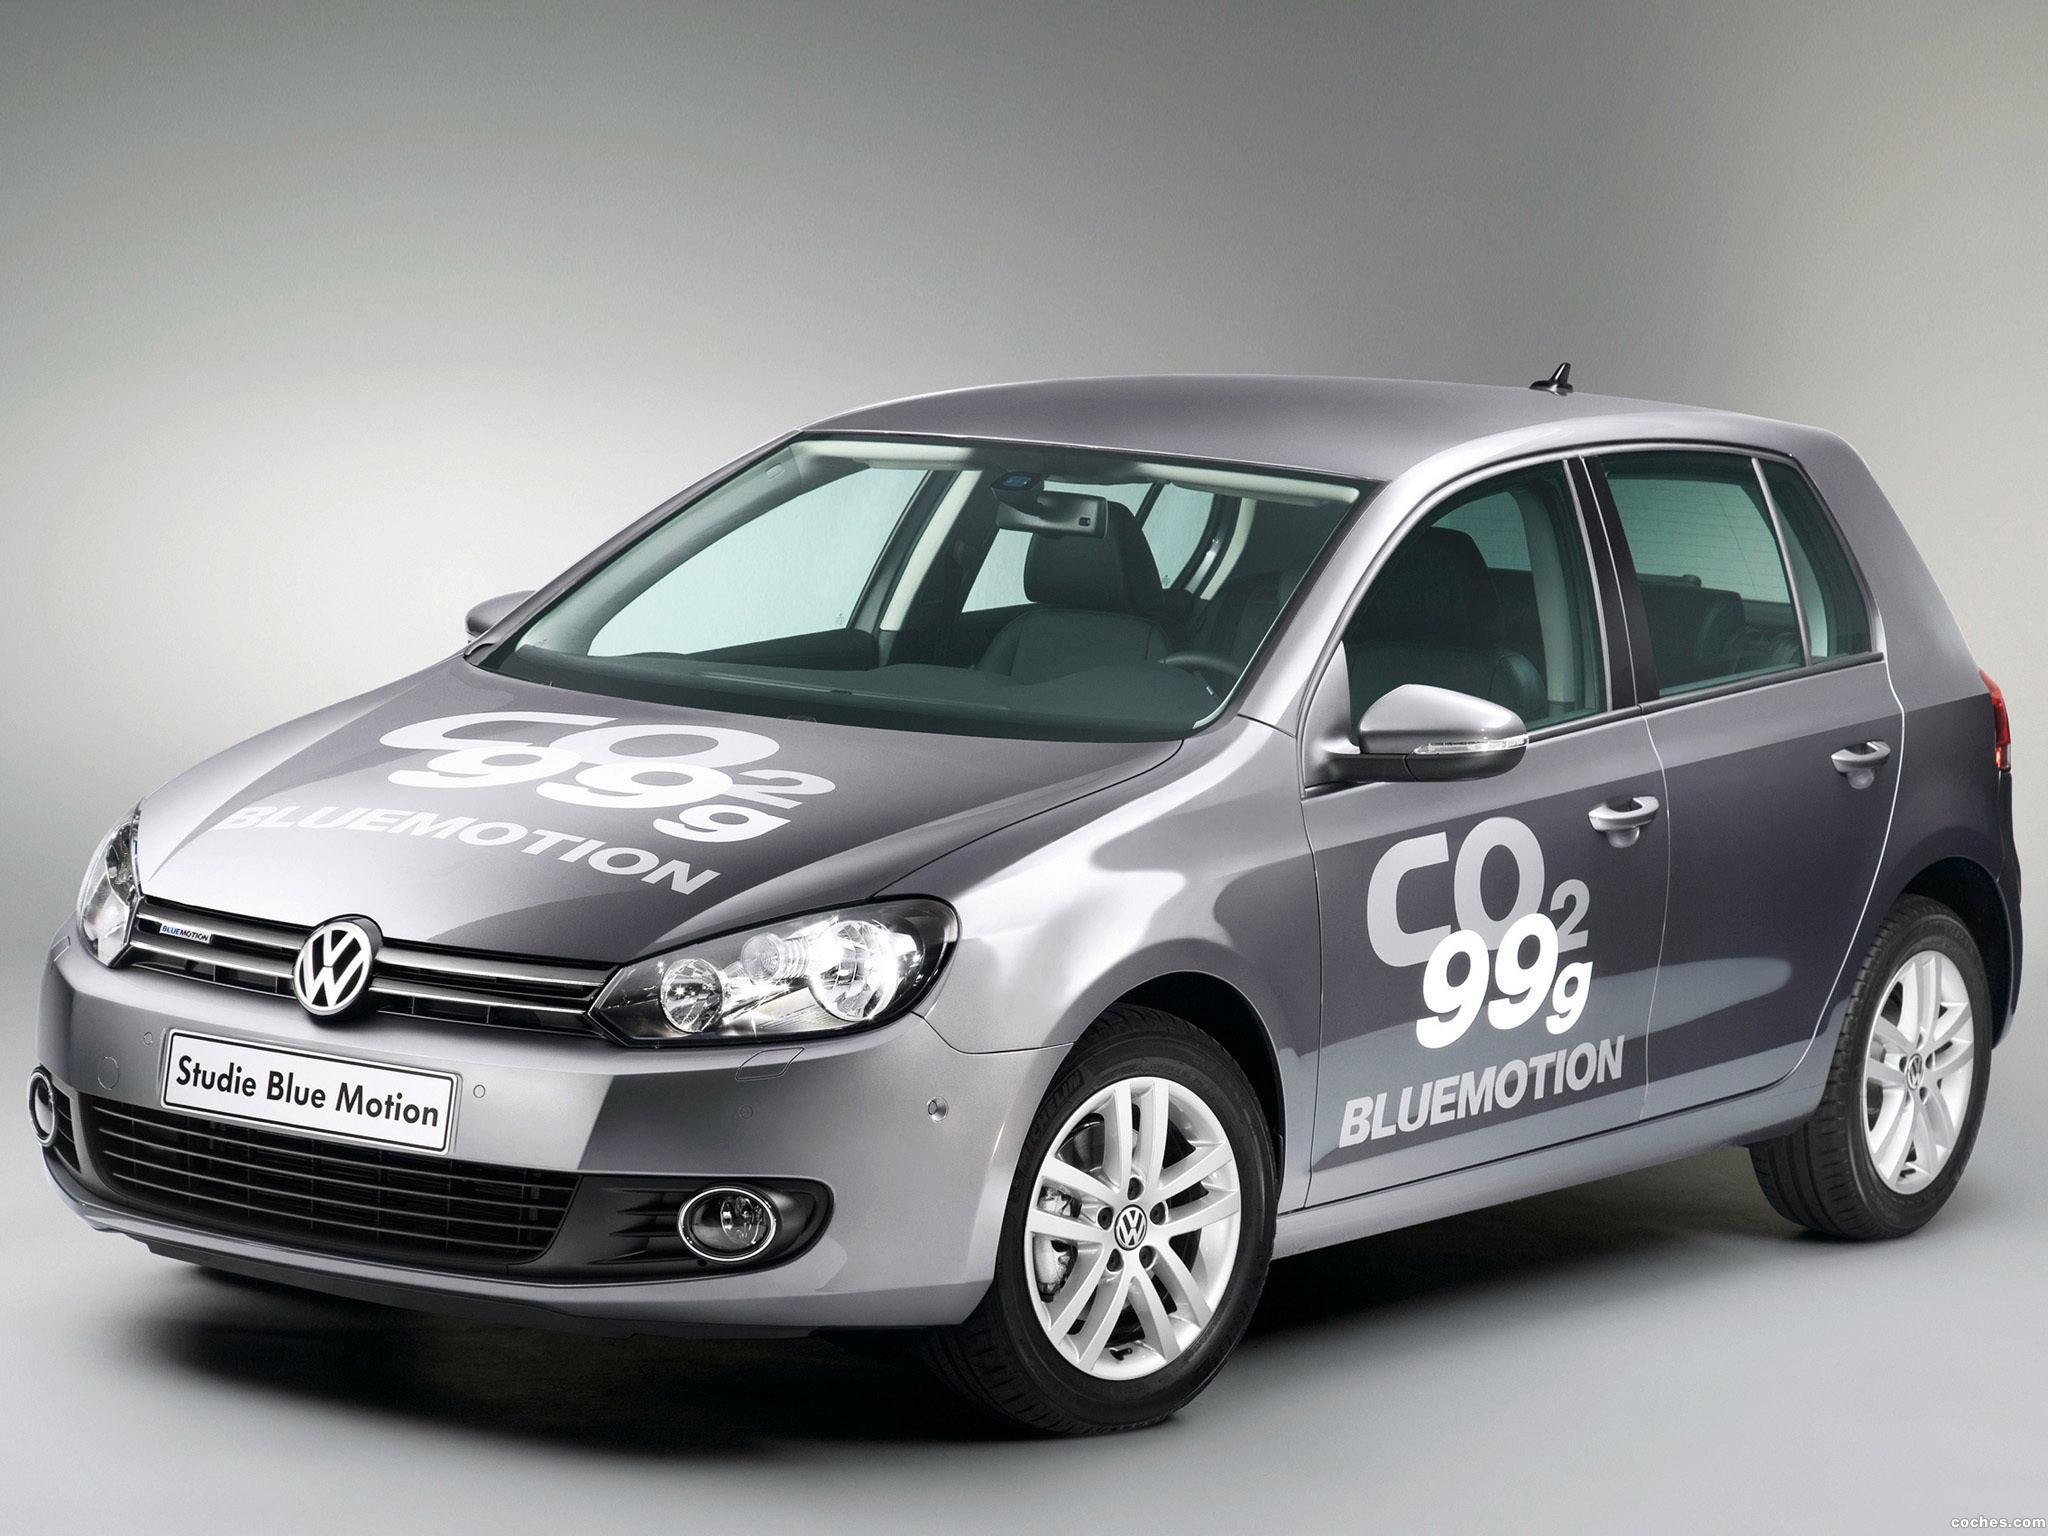 Foto 0 de Volkswagen Golf VI Blue Motion Concept 2008